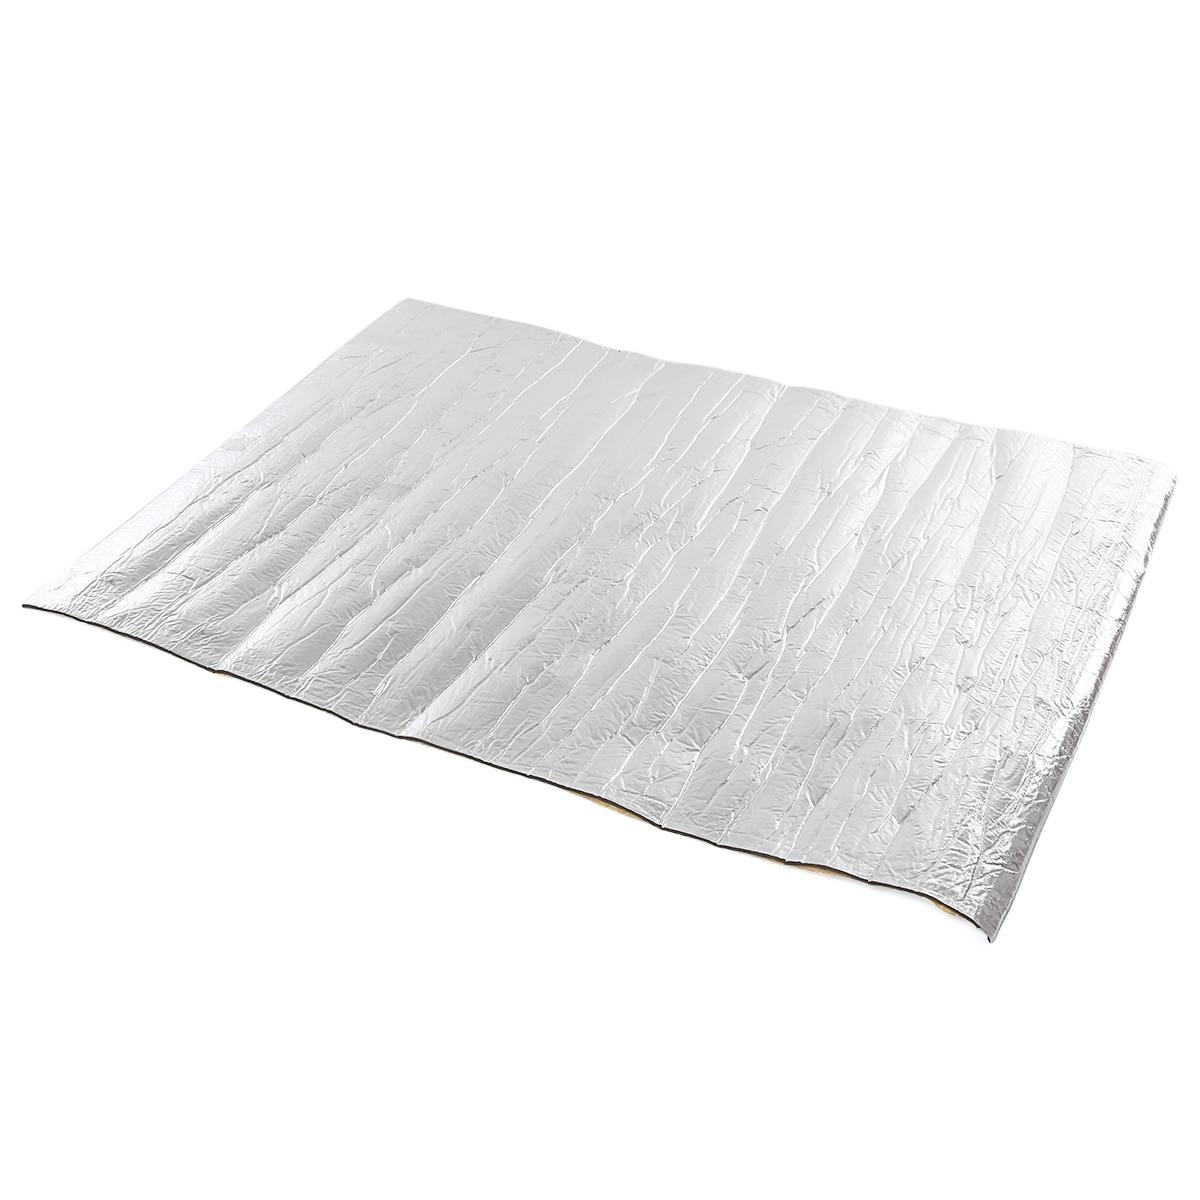 6mm 100cm x 140cm Car Sound Proofing Deadening Insulation Mat Aluminum Foil Cotton Heat Waterproof Resistant